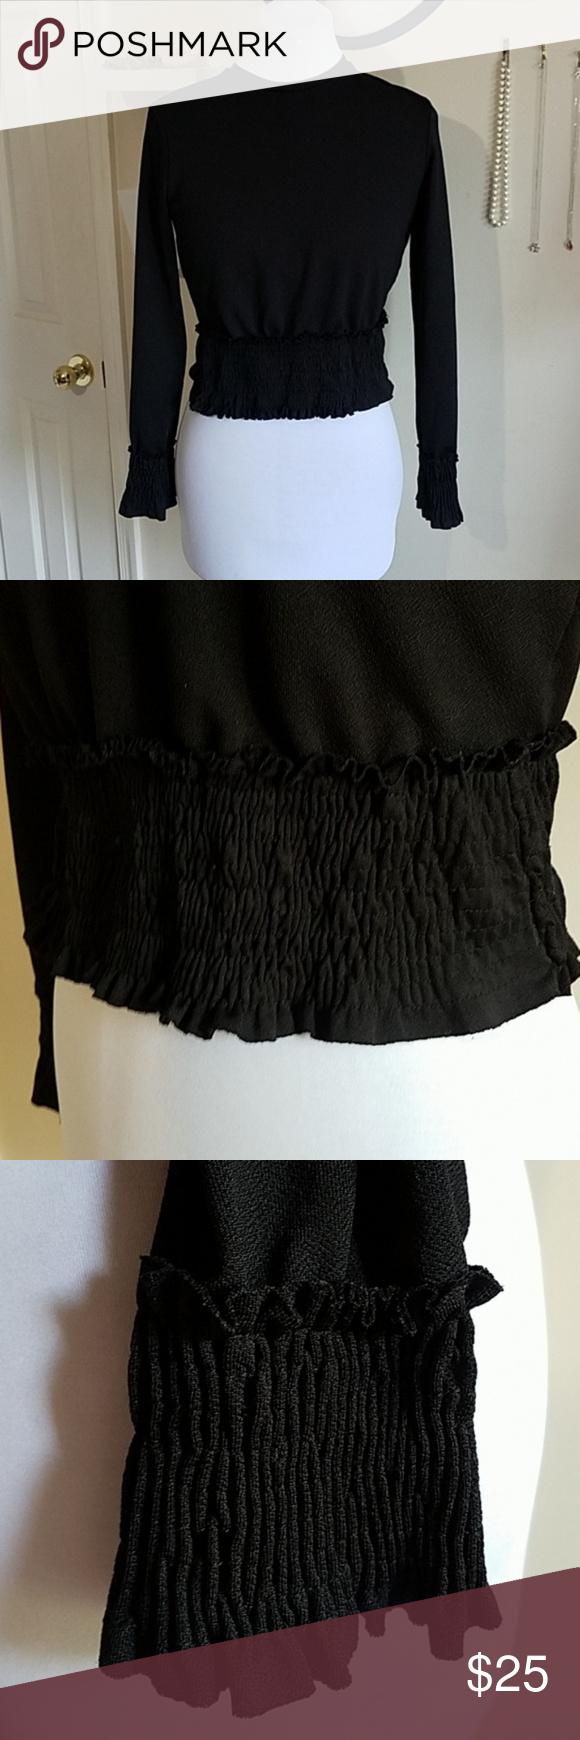 576d284d6cd9ca Zara Collection Black Long Sleeve Crop Top